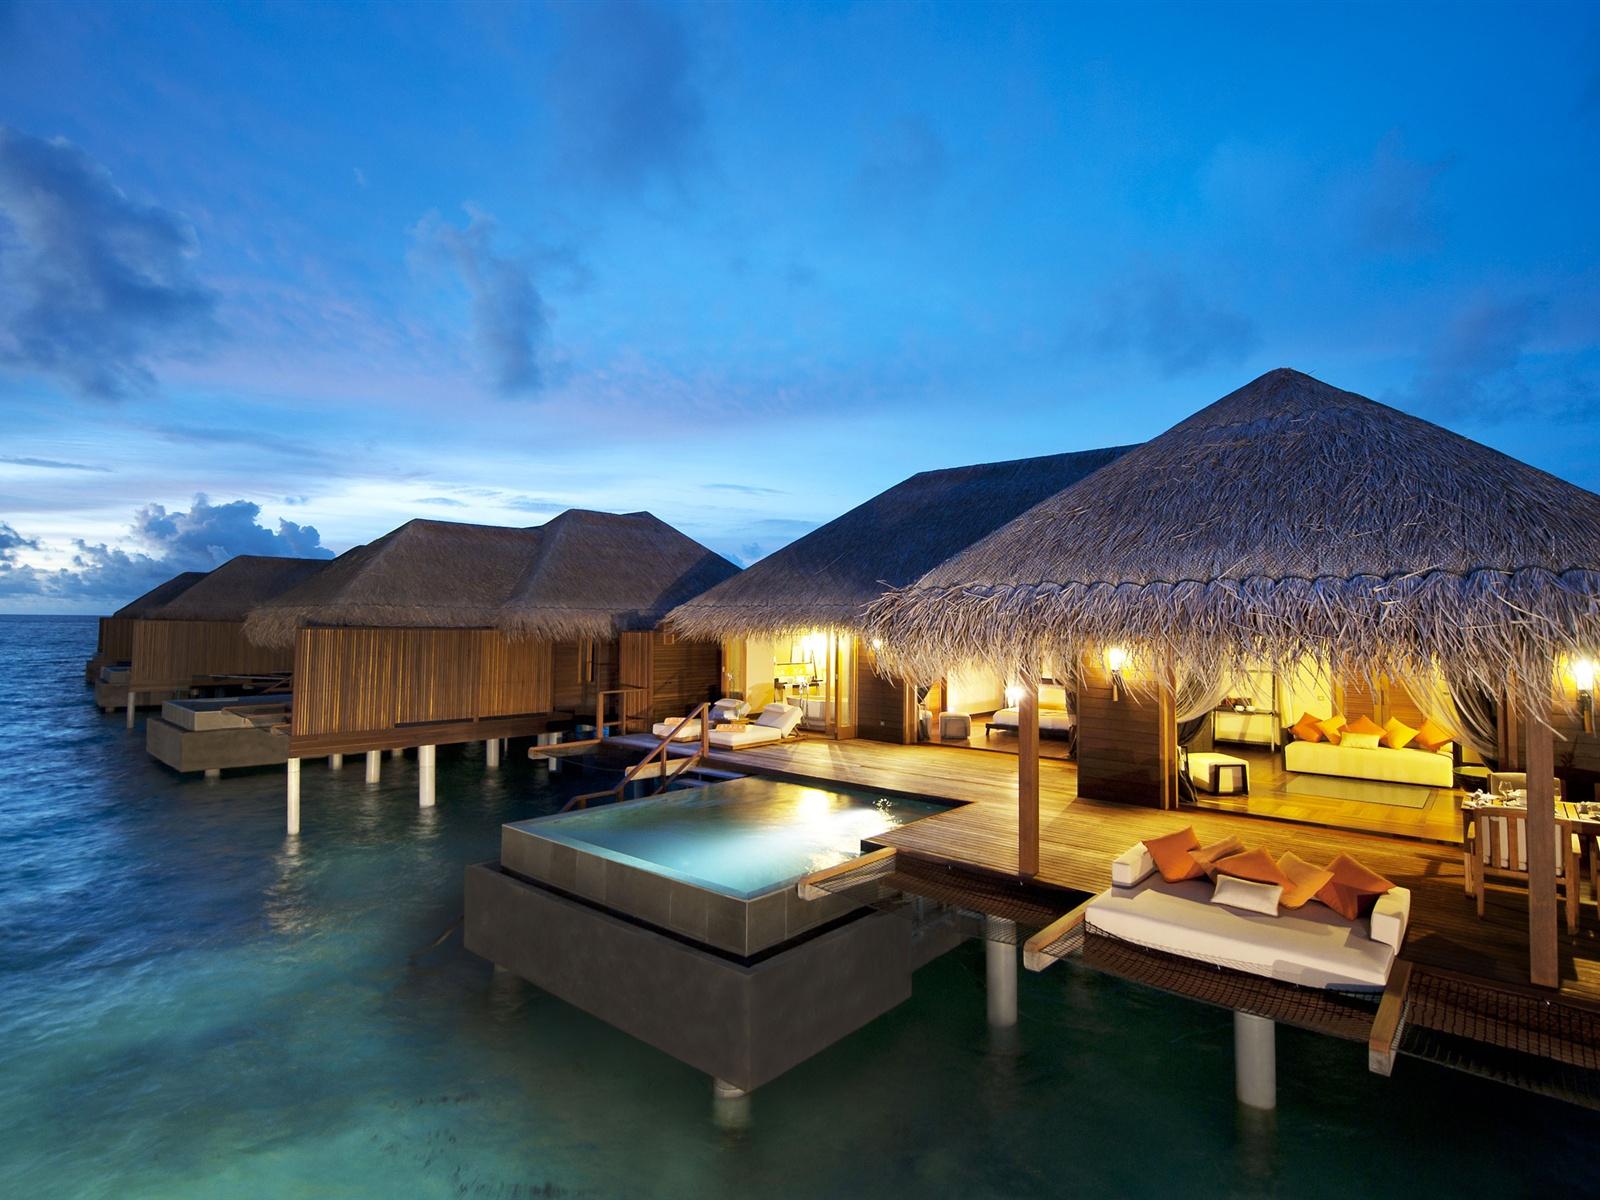 Hotel Maldives Indian Ocean Wallpaper 1600x1200